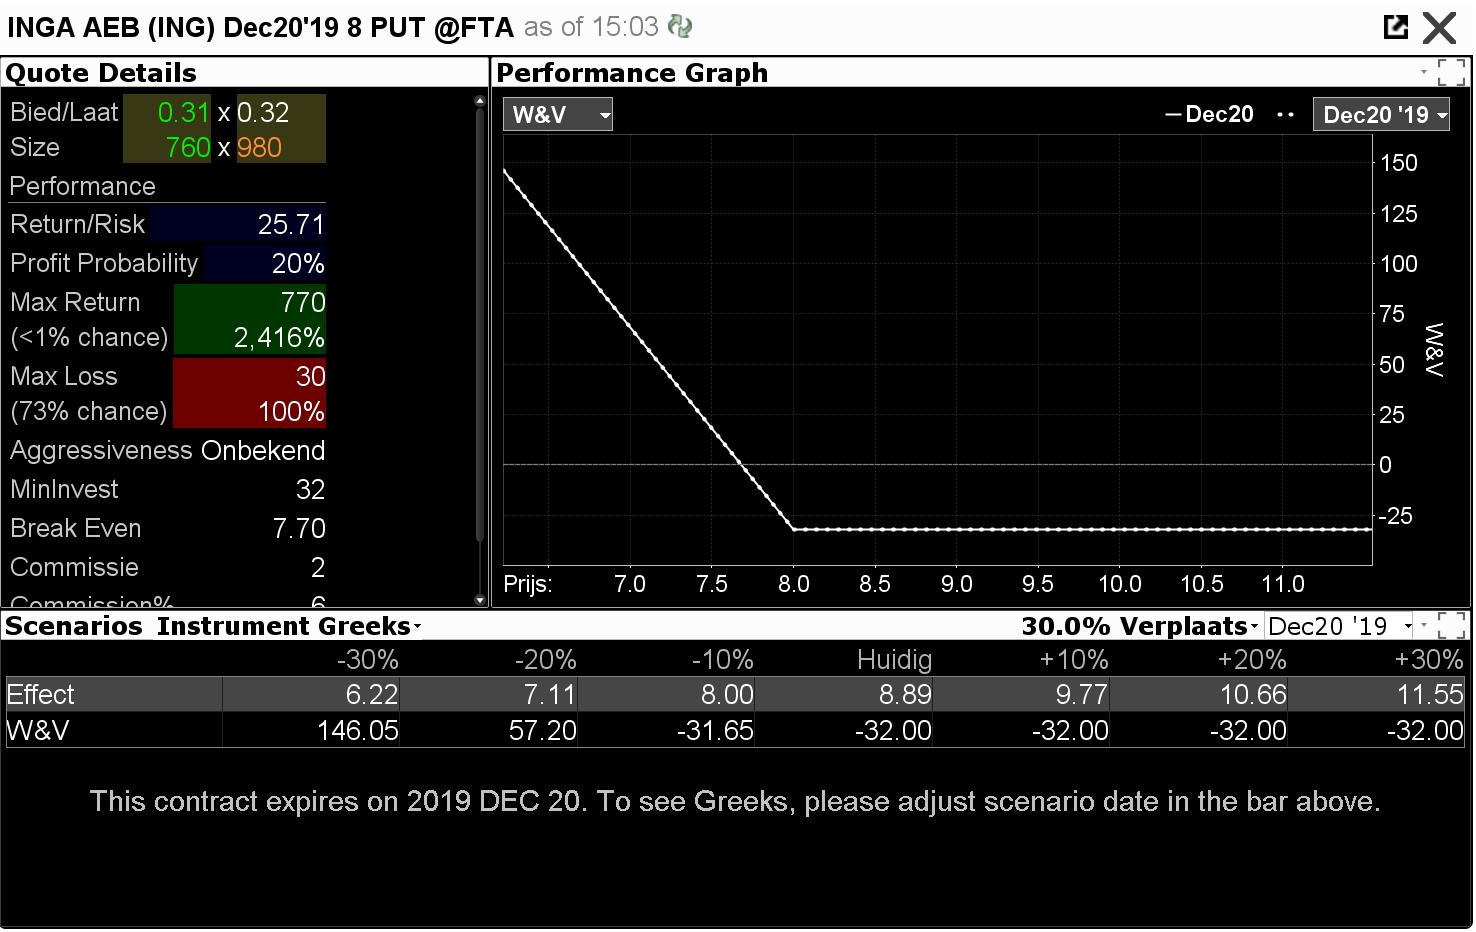 Aandelenopties - Performance graph put ING